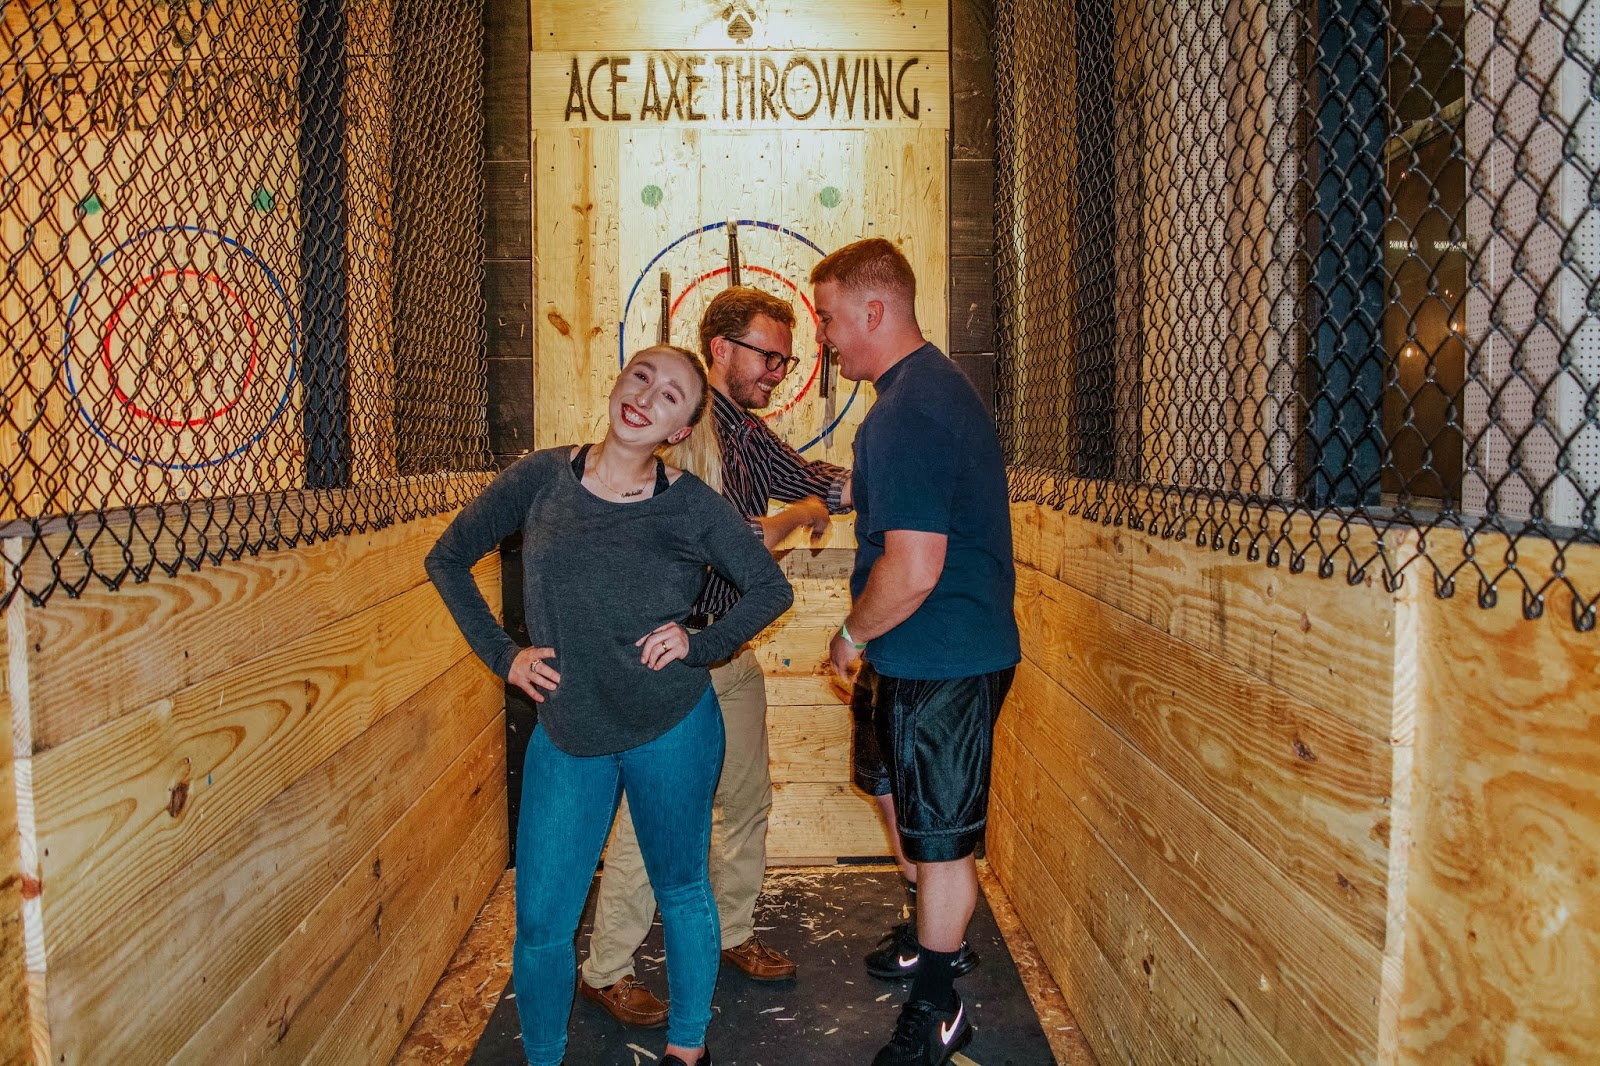 Family Bonding Over Axe Throwing